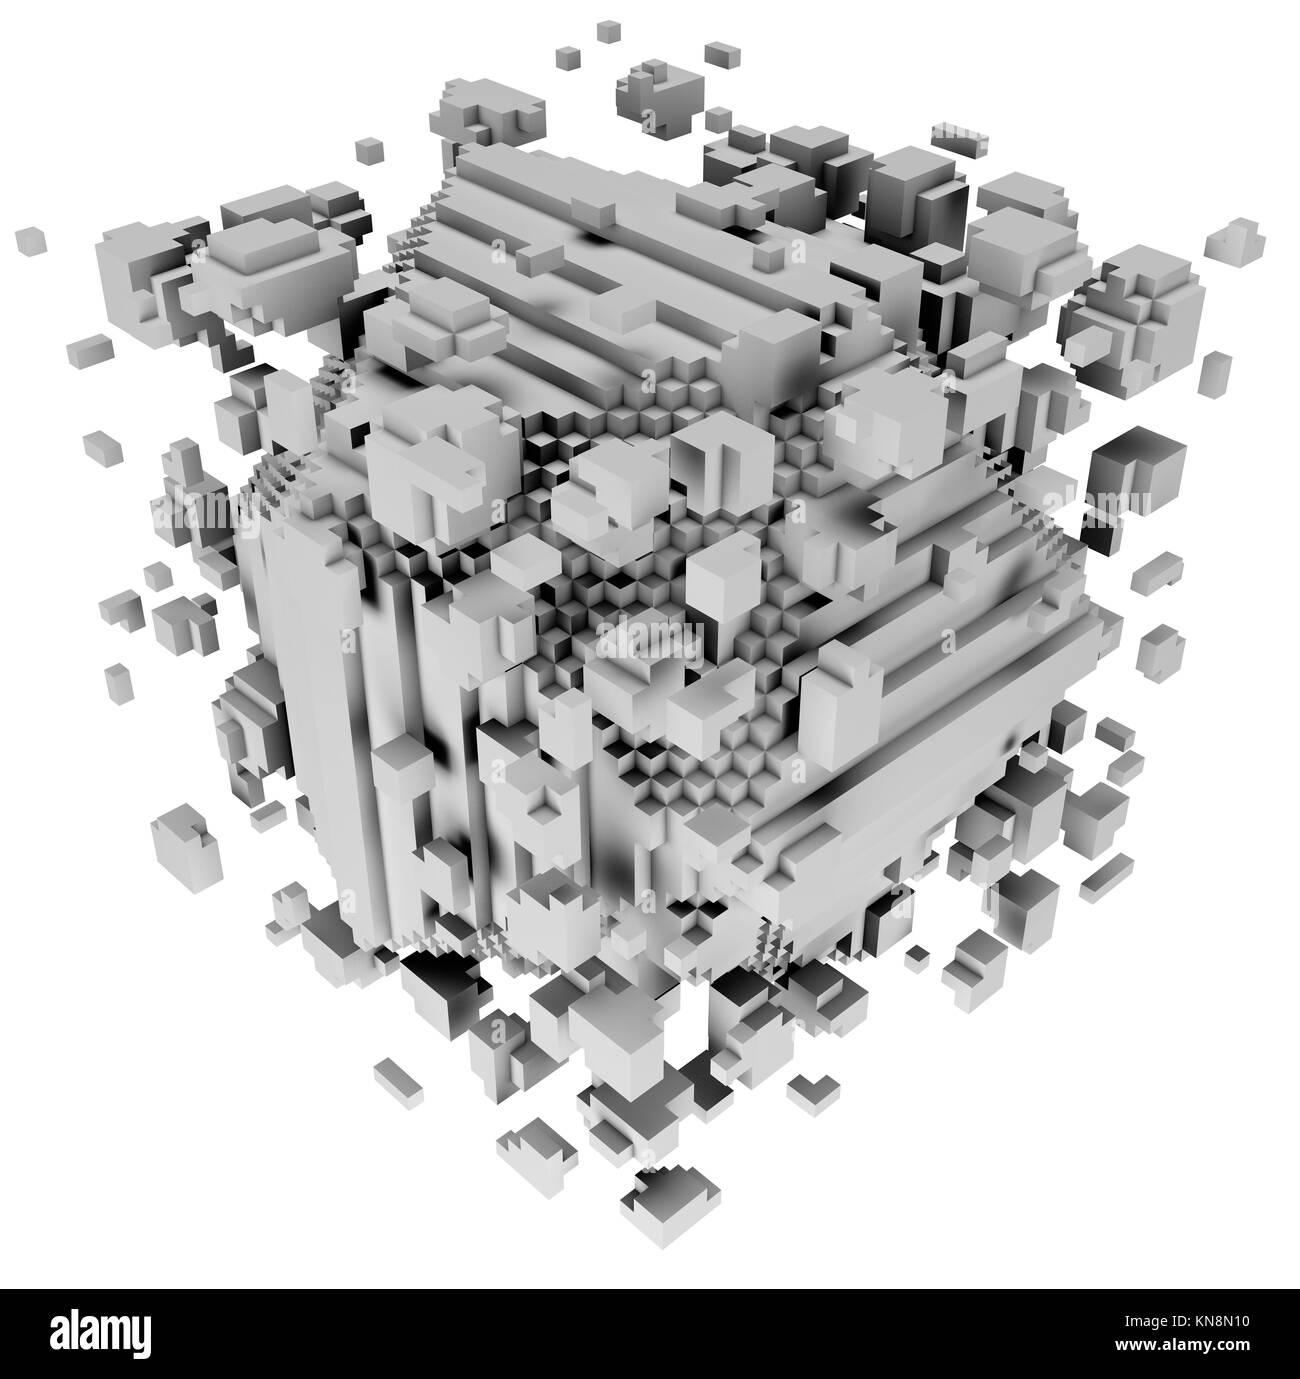 3D illustration of three-dimensional model consist of blocks. - Stock Image